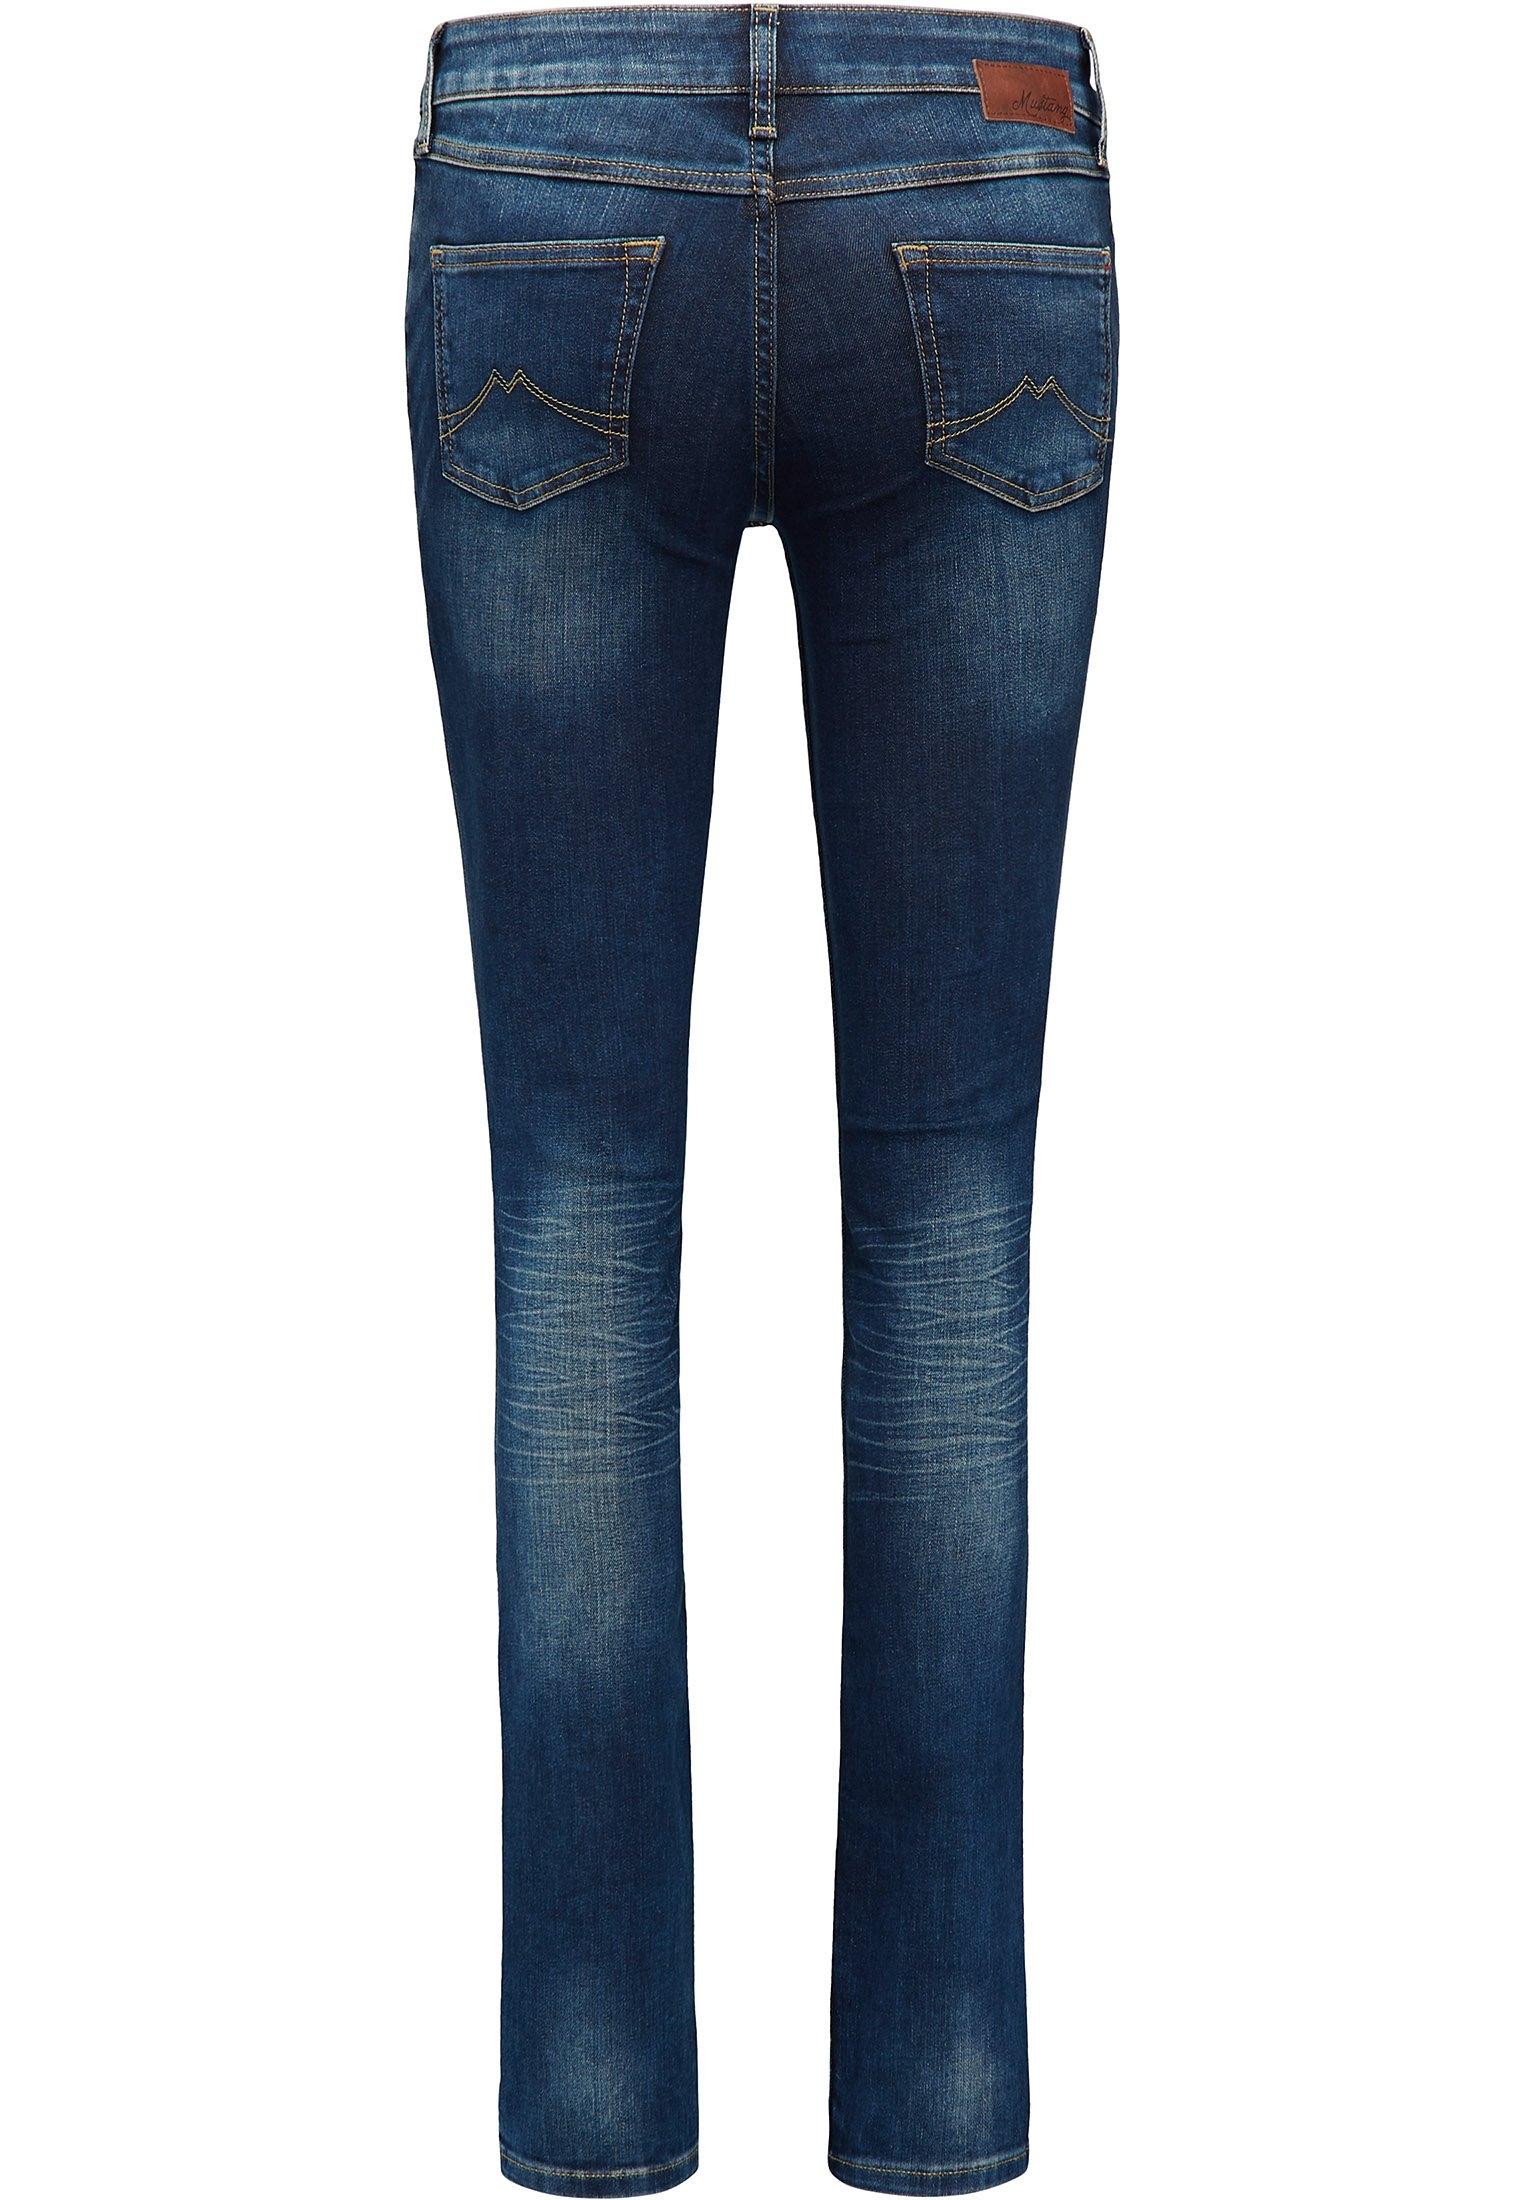 MUSTANG stretch jeans Jasmin slim nu online bestellen